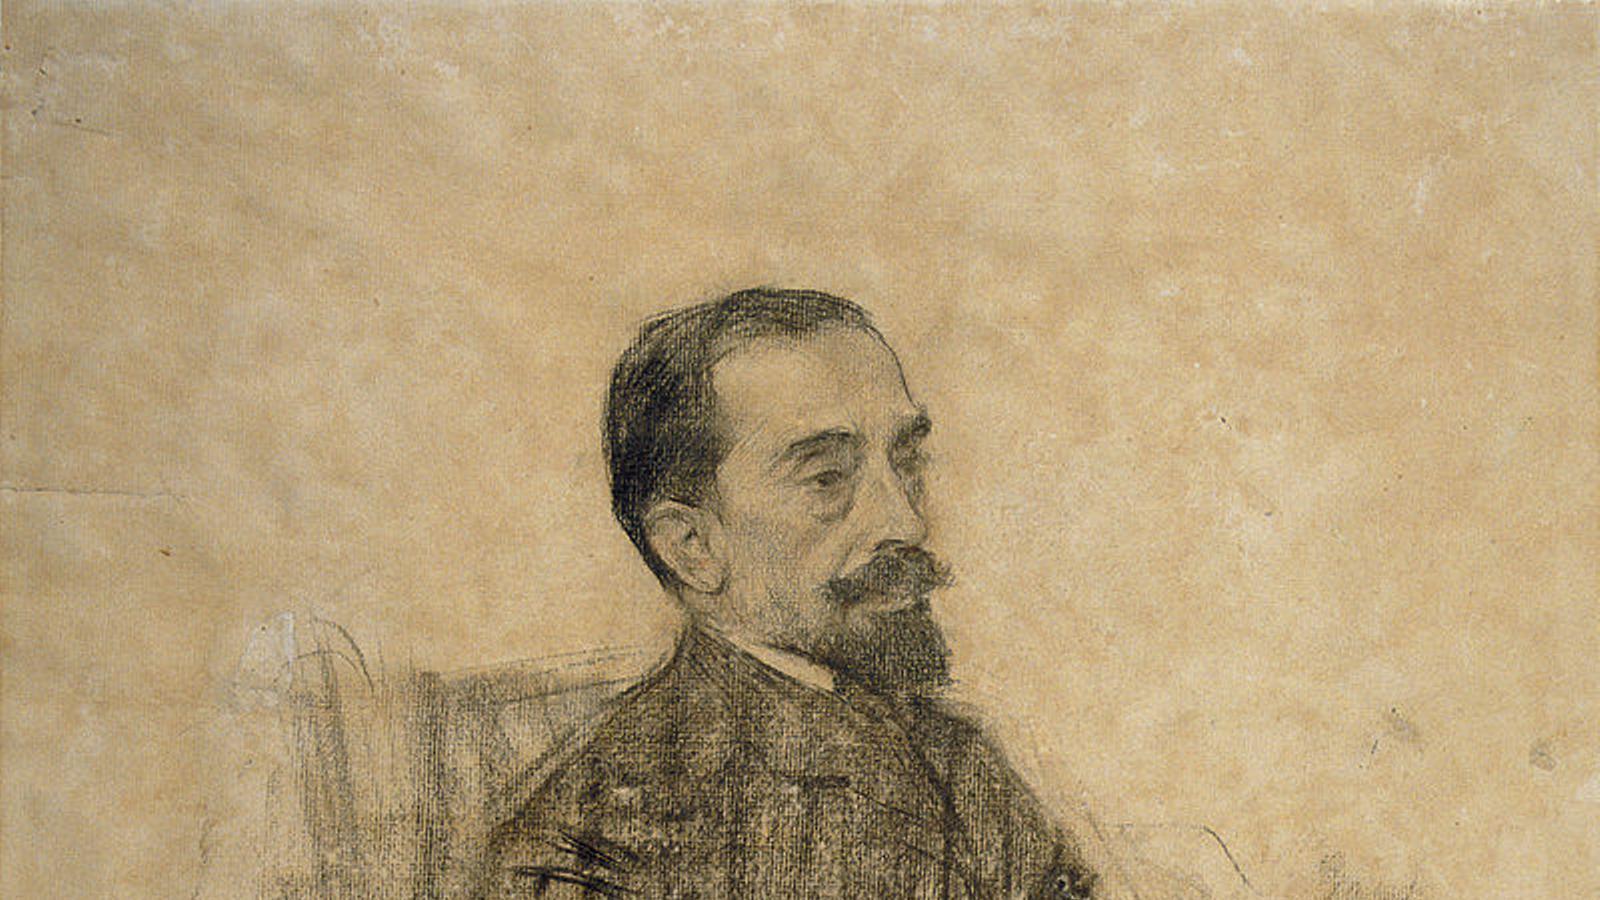 Esbós de Ramon Casas del poeta Joan Maragall